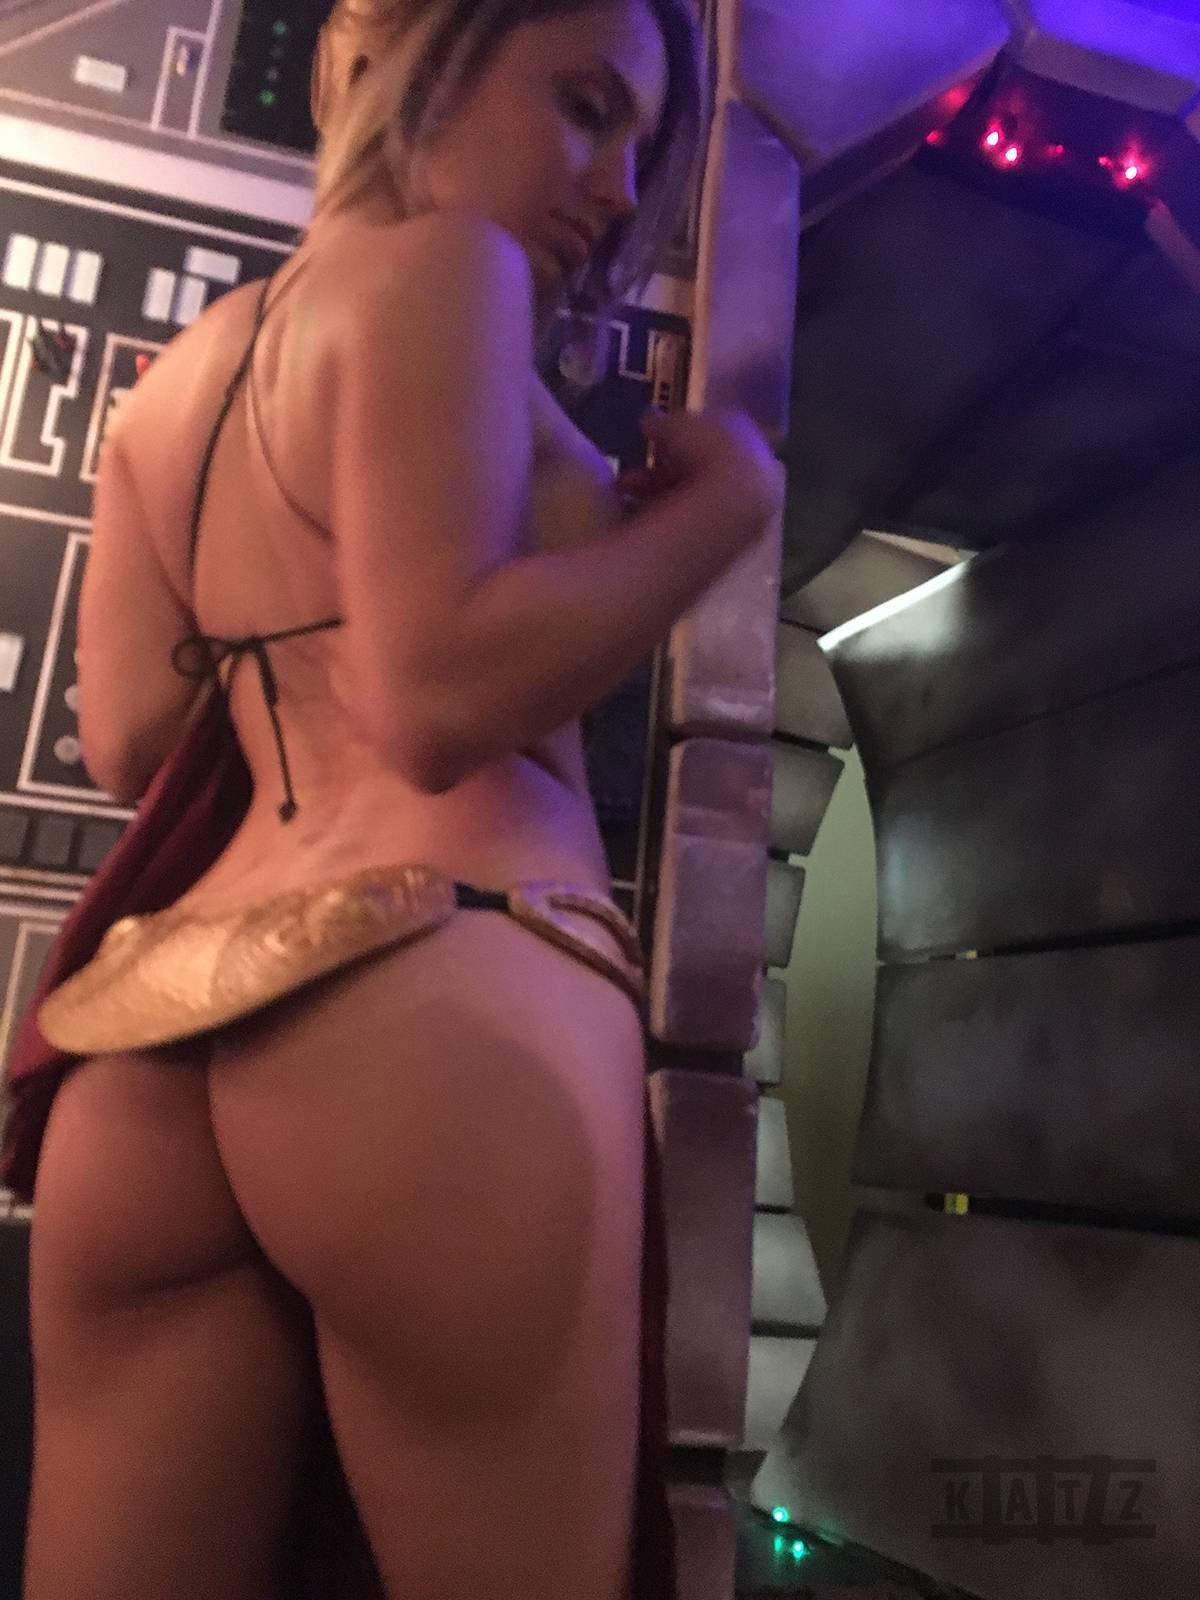 Liz Katz Slave Leia Nude Cosplay Onlyfans Leaked Photos 13